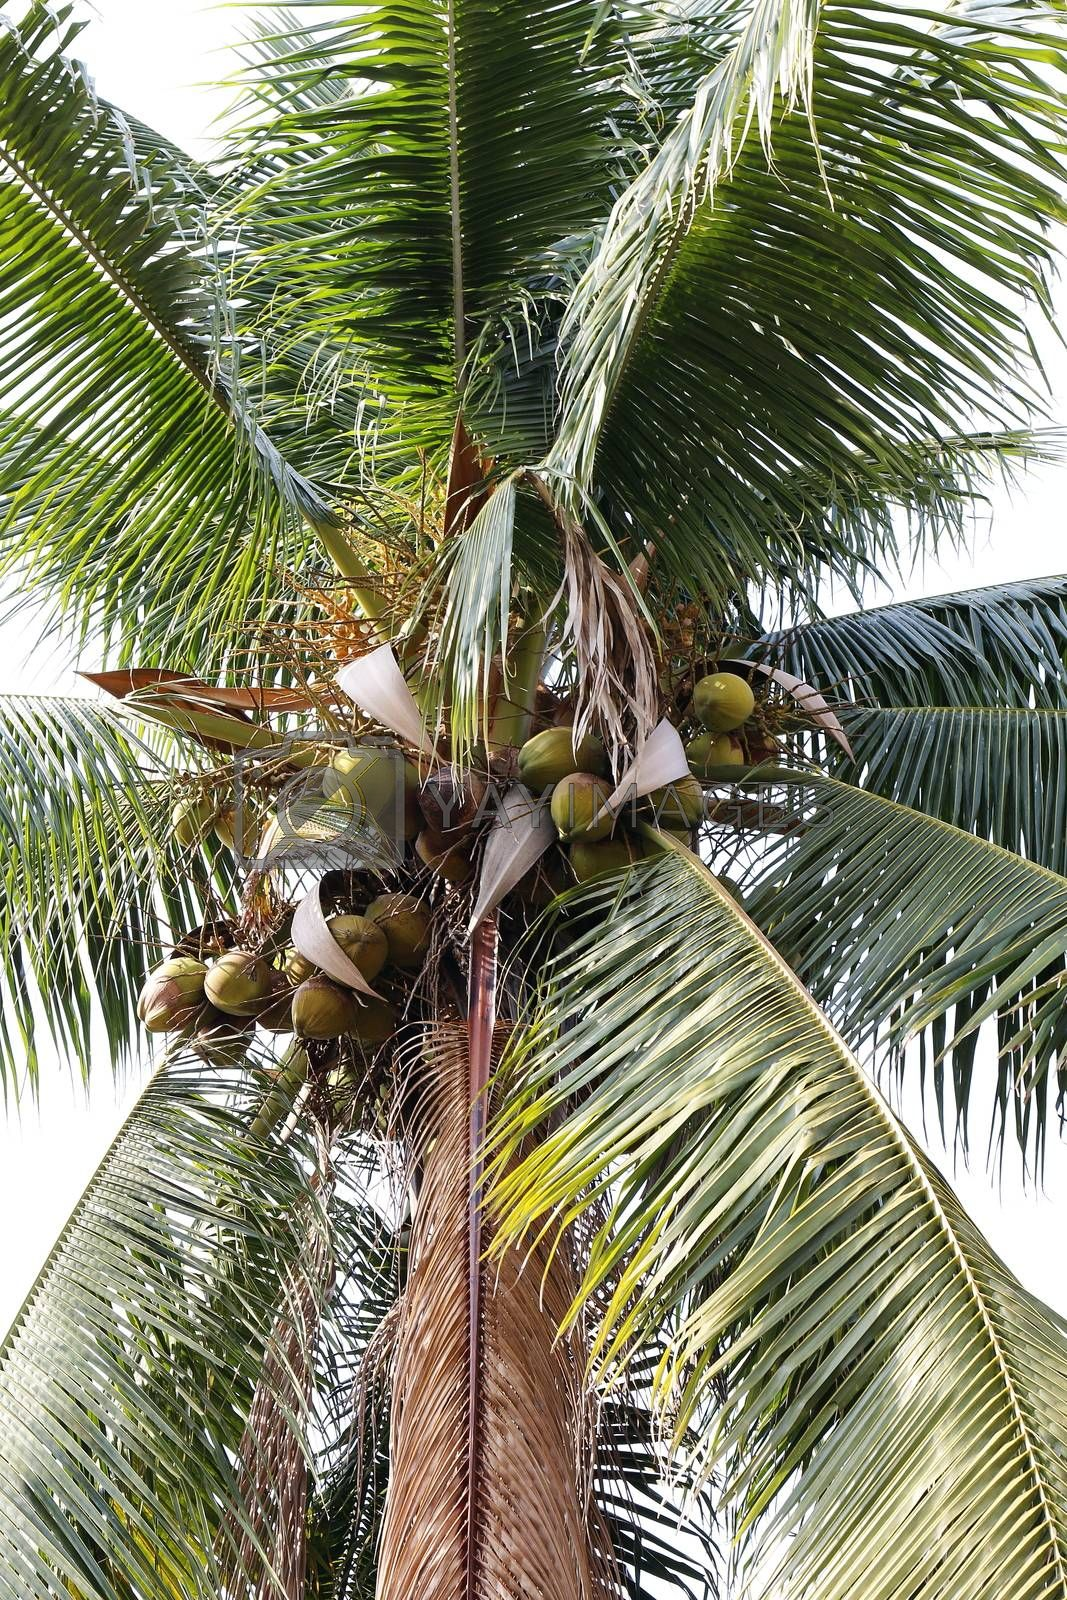 Royalty free image of coconut farm, plantation coconut tree by cgdeaw